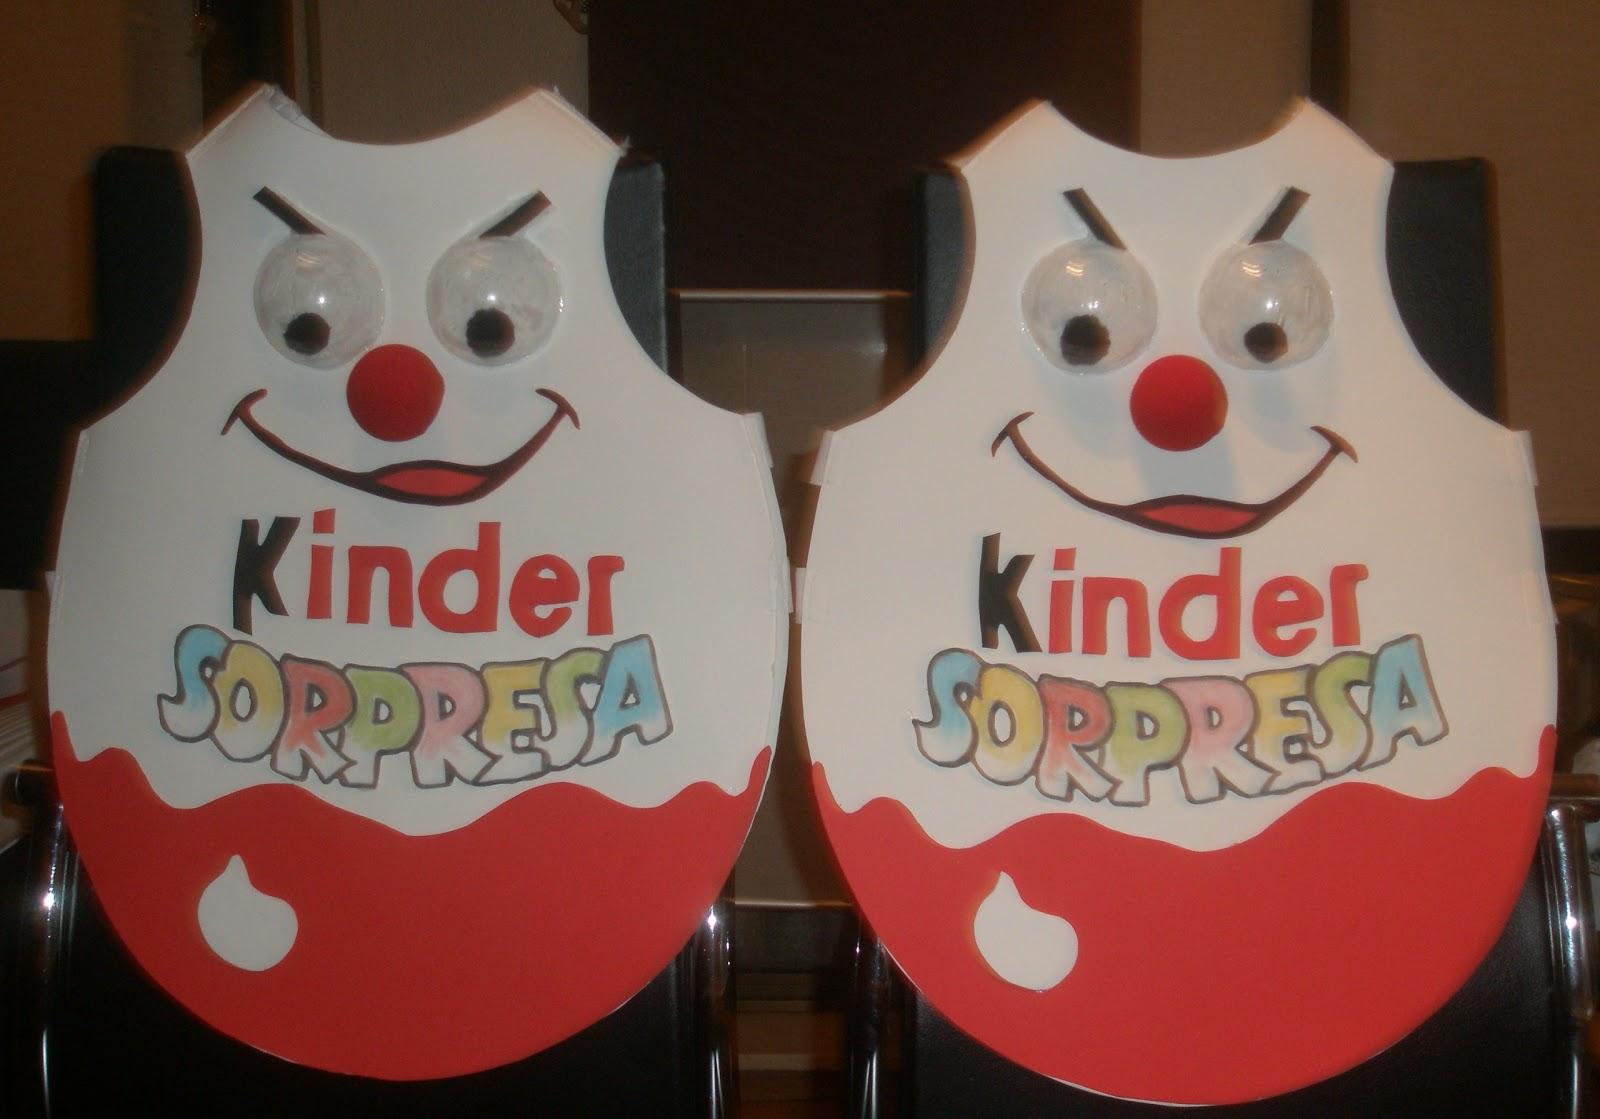 Foamais disfraz kinder sorpresa - Disfraces carnaval original ...